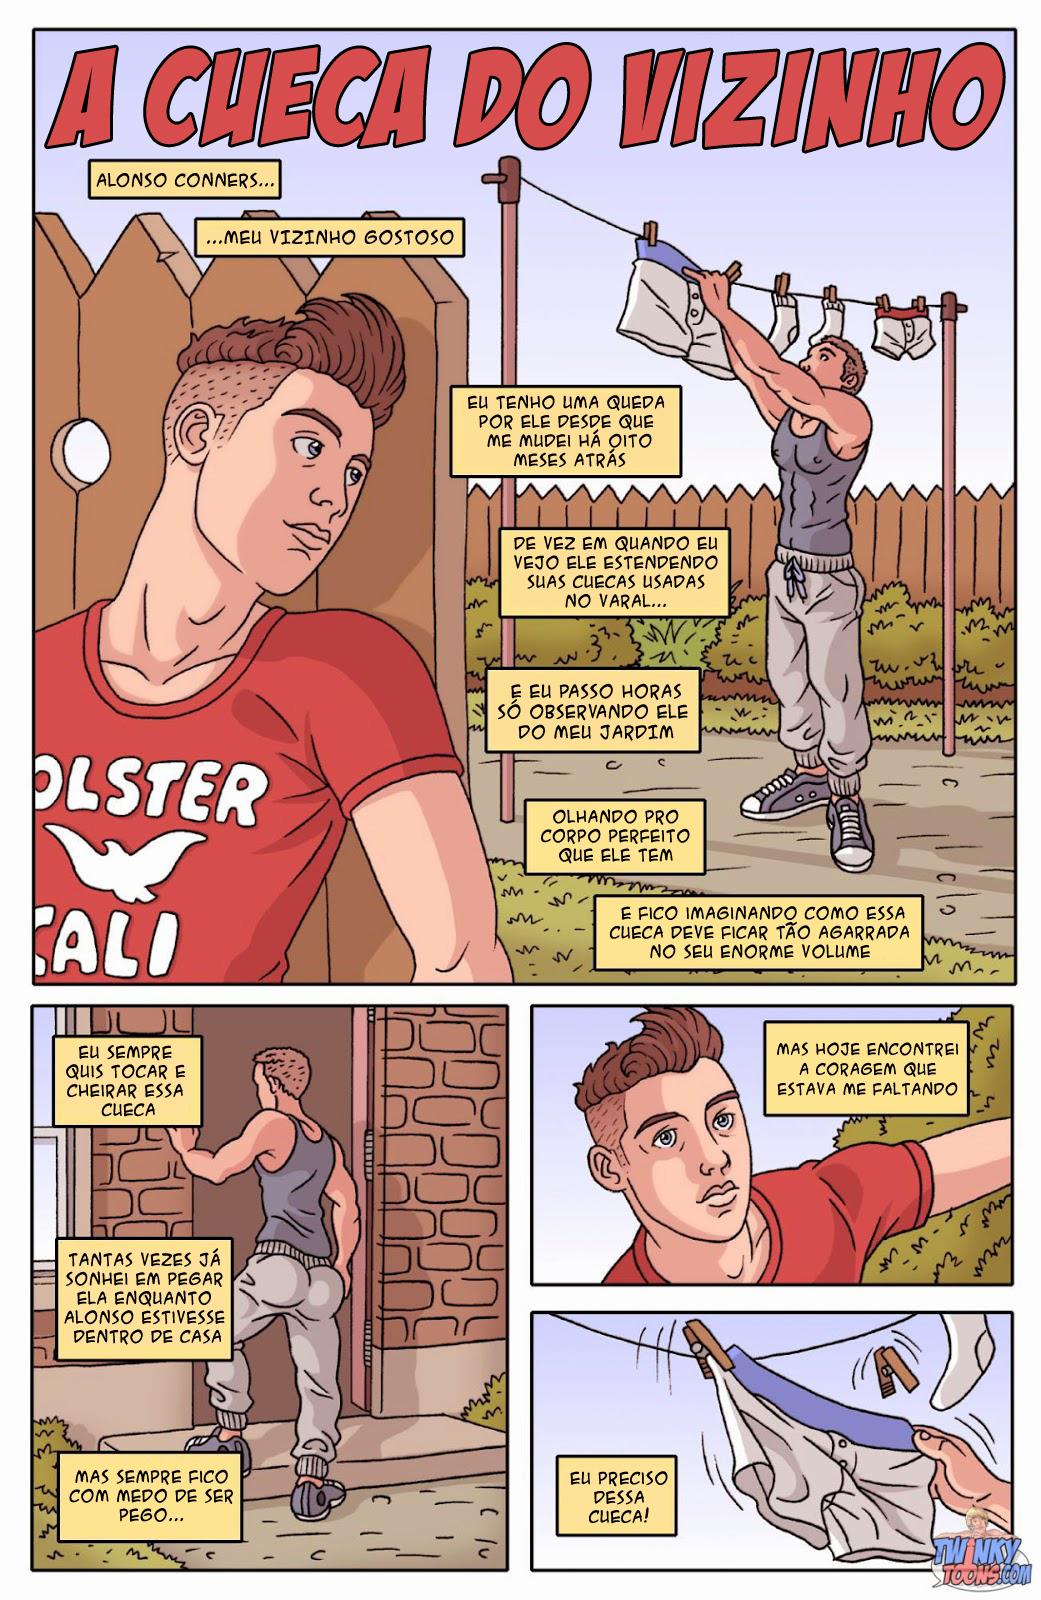 Gay Comics The Neighbour's Undertøj-3008